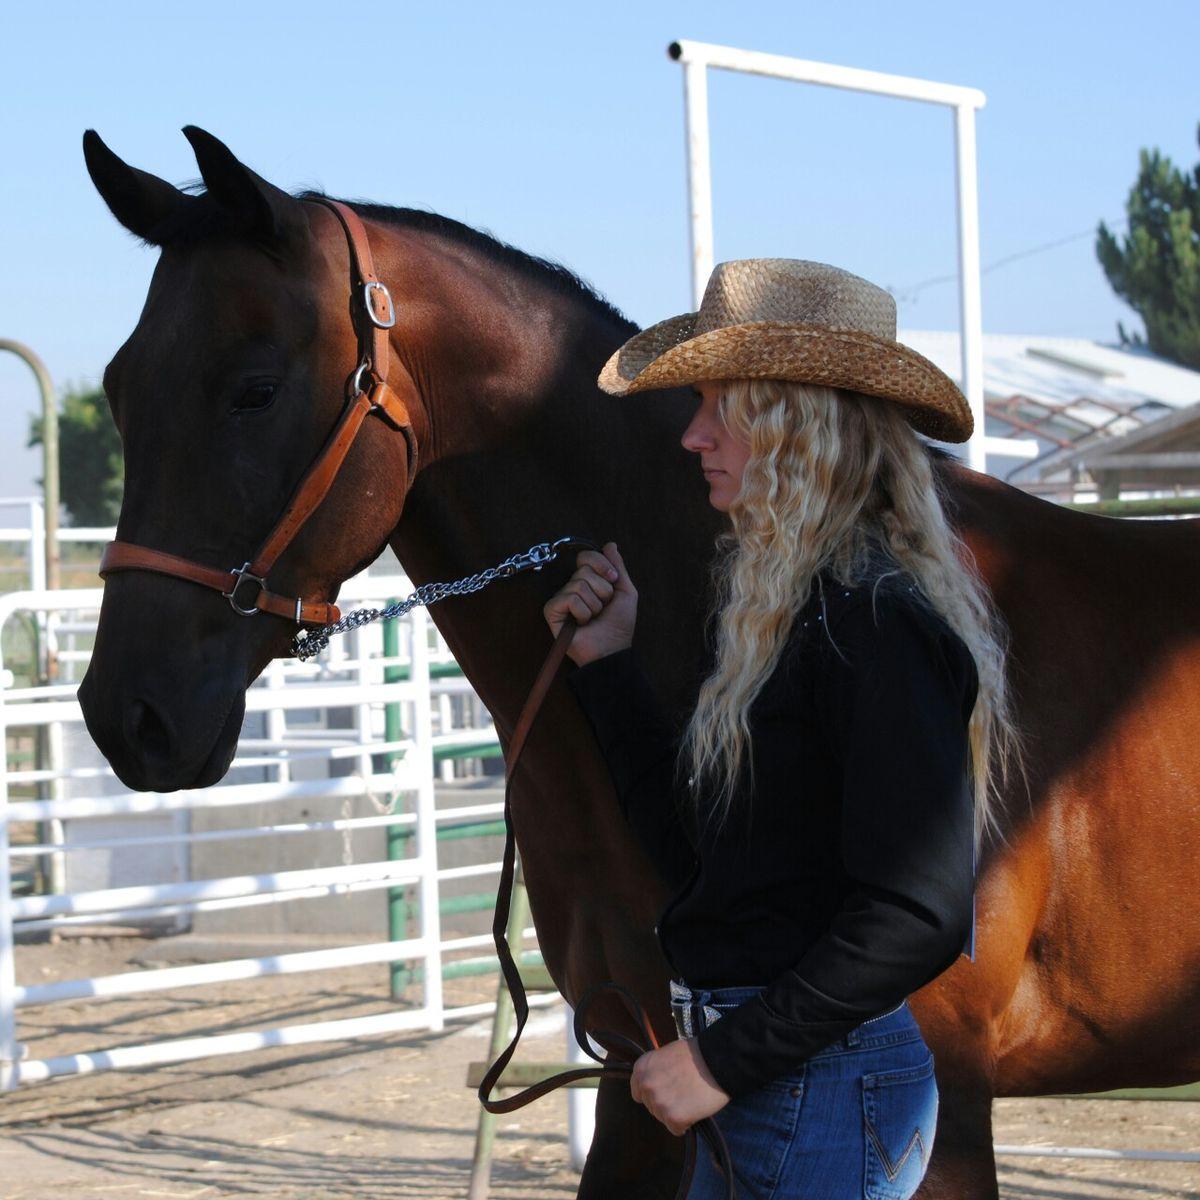 4h horse showmanship Horses, Beautiful, Showmanship